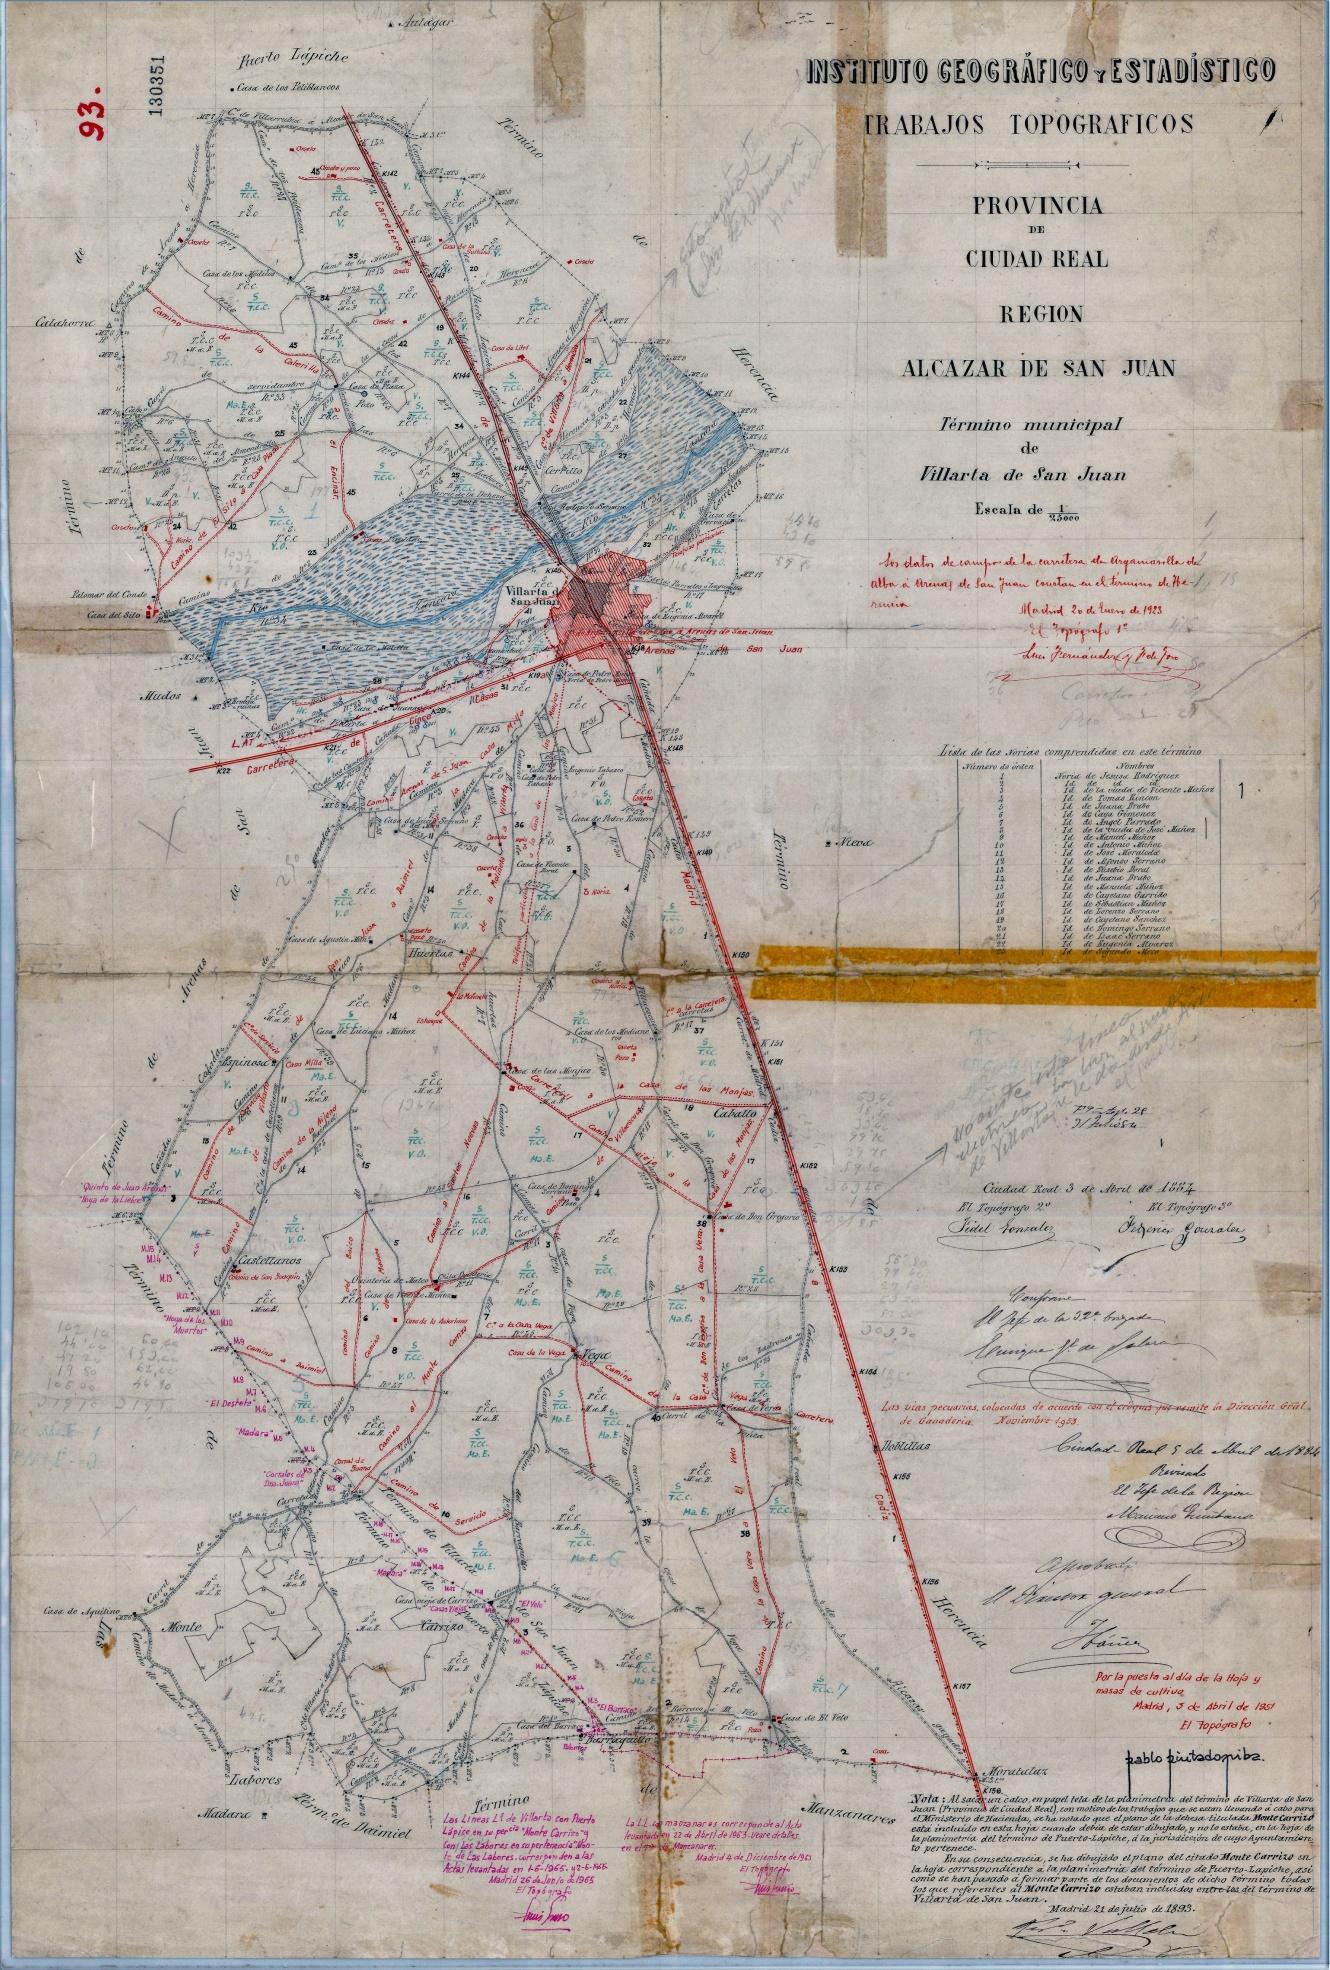 Mapa Villarta copia 130351.jpg